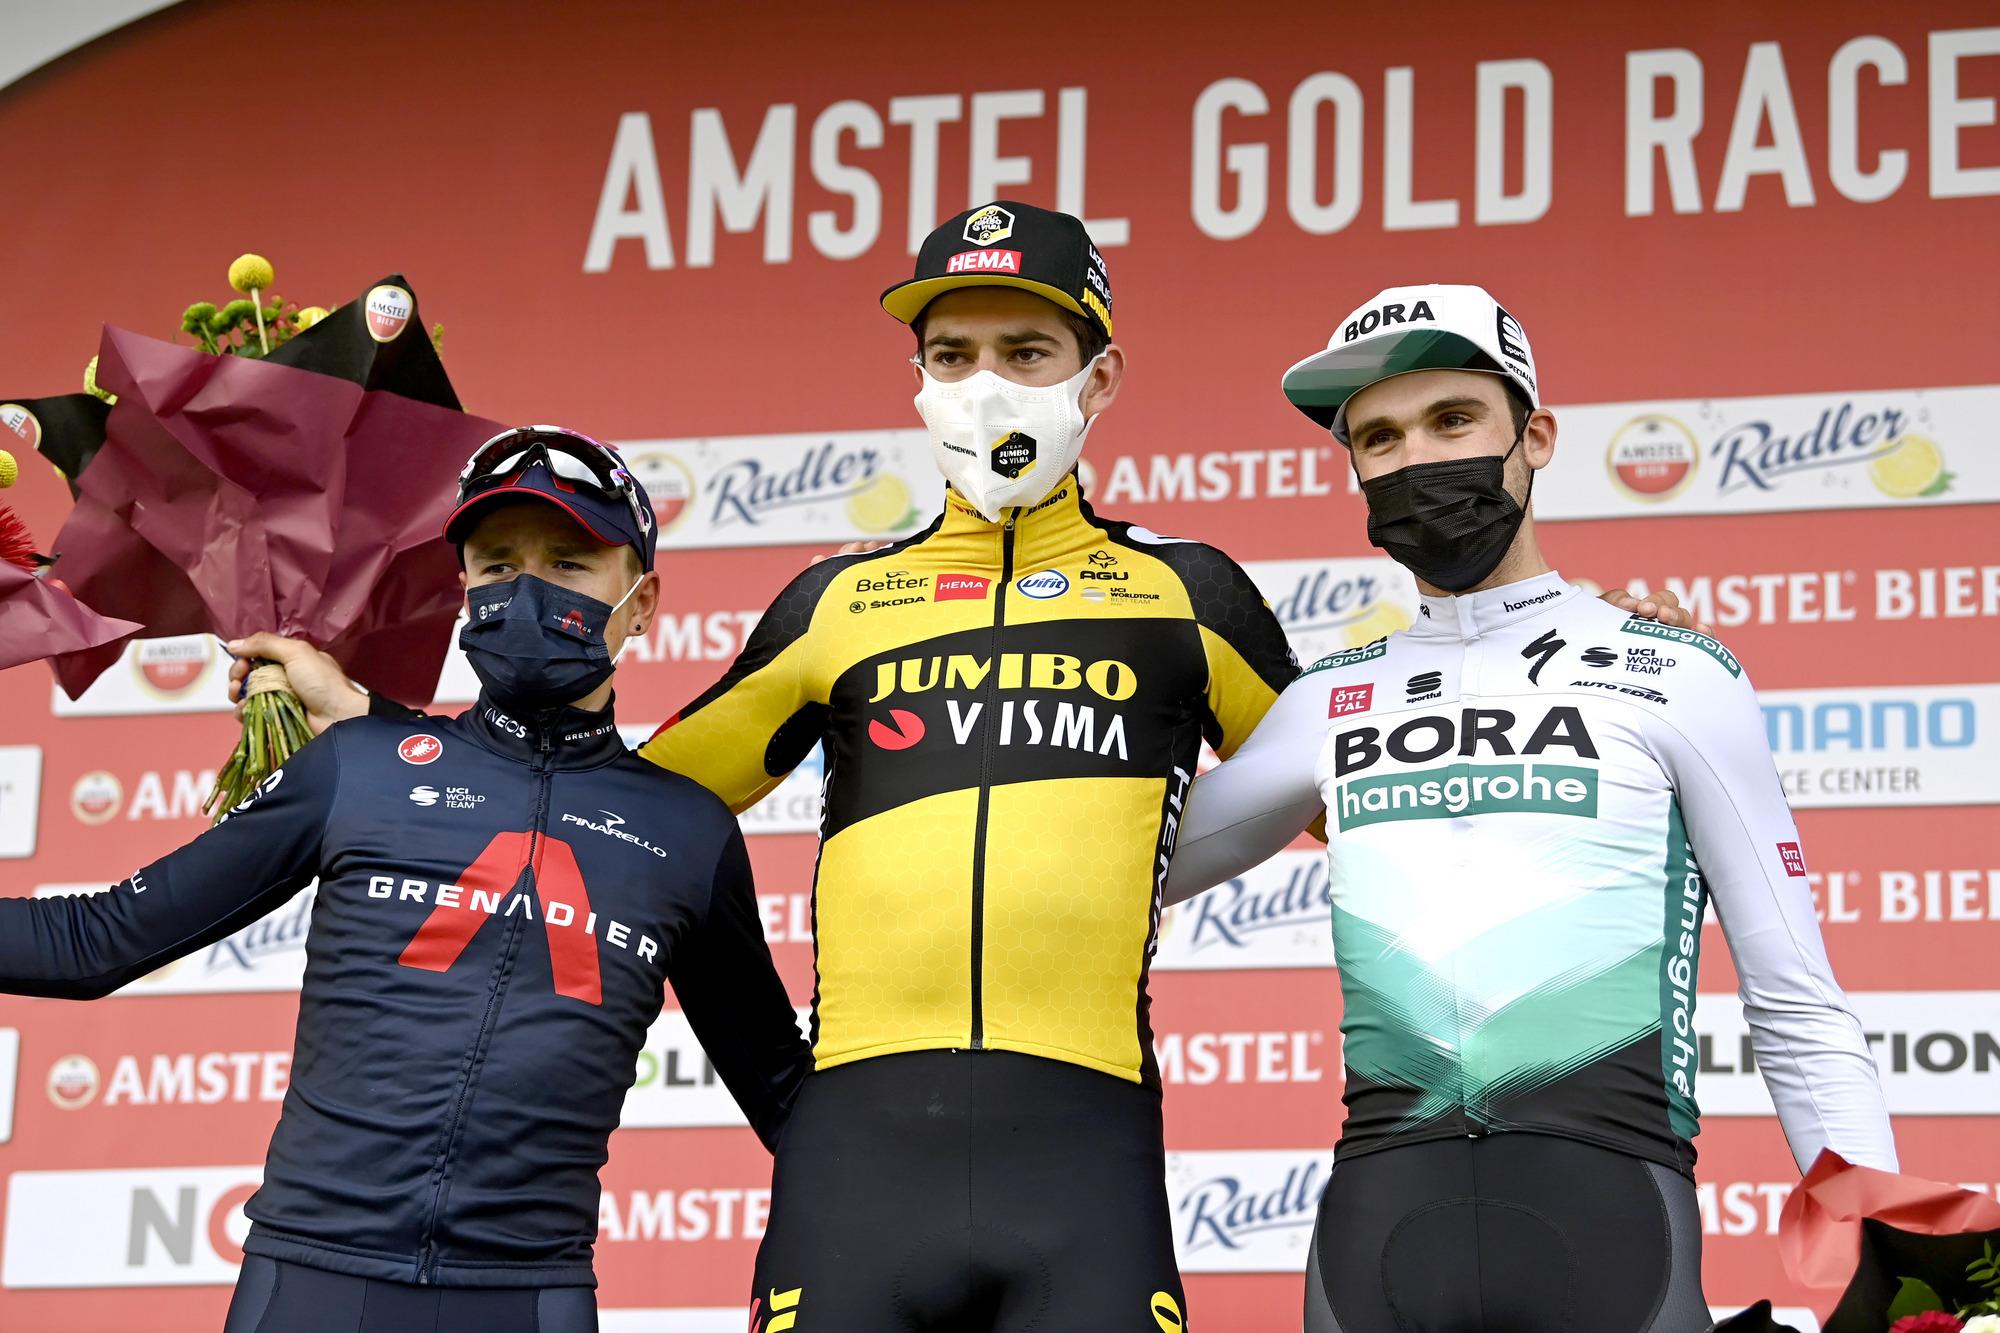 Amstel Gold Race 2021 - 55th Edition - Valkenburg - Berg en Terblijt 218,6 km - 18/04/2021 - Wout Van Aert (BEL - Jumbo - Visma) - Tom Pidcock (GBR - Ineos Grenadiers) - Maximilian Schachmann (GER - Bora - Hansgrohe) - photo Nico Vereecken/PN/BettiniPhoto©2021